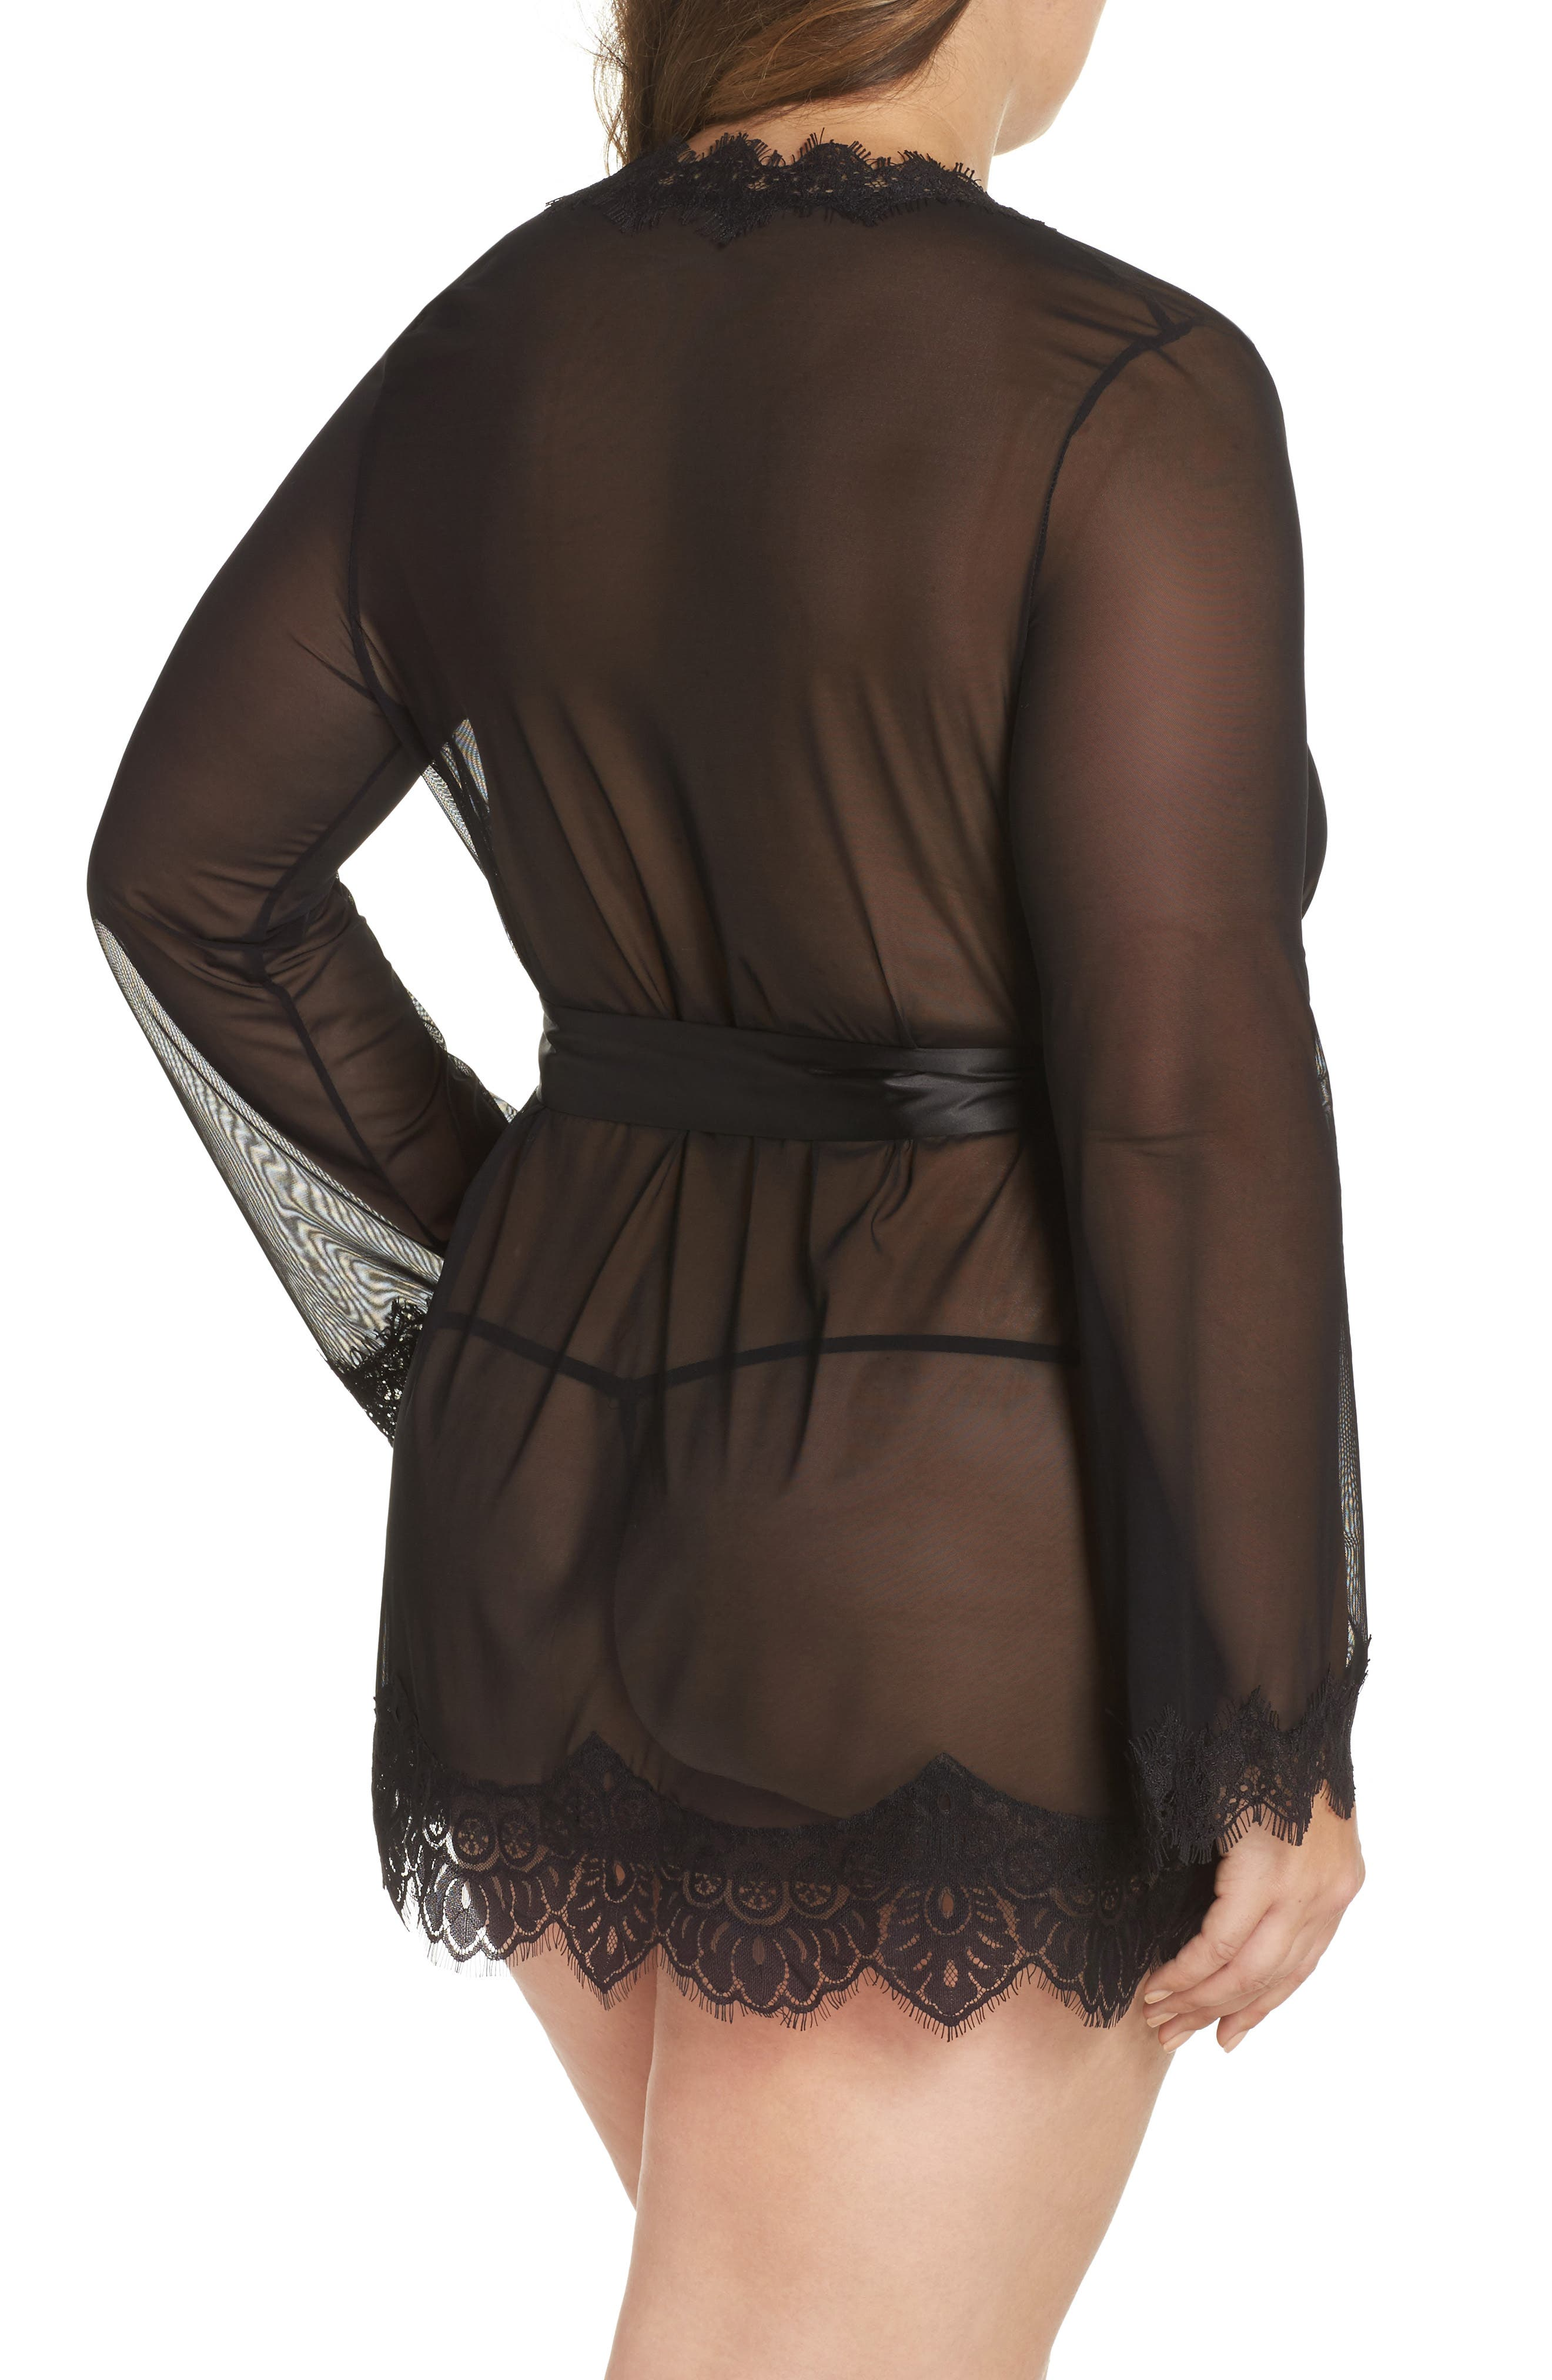 Alternate Image 2  - Oh La La Cheri Eyelash Curves Robe & G-String (Plus Size)